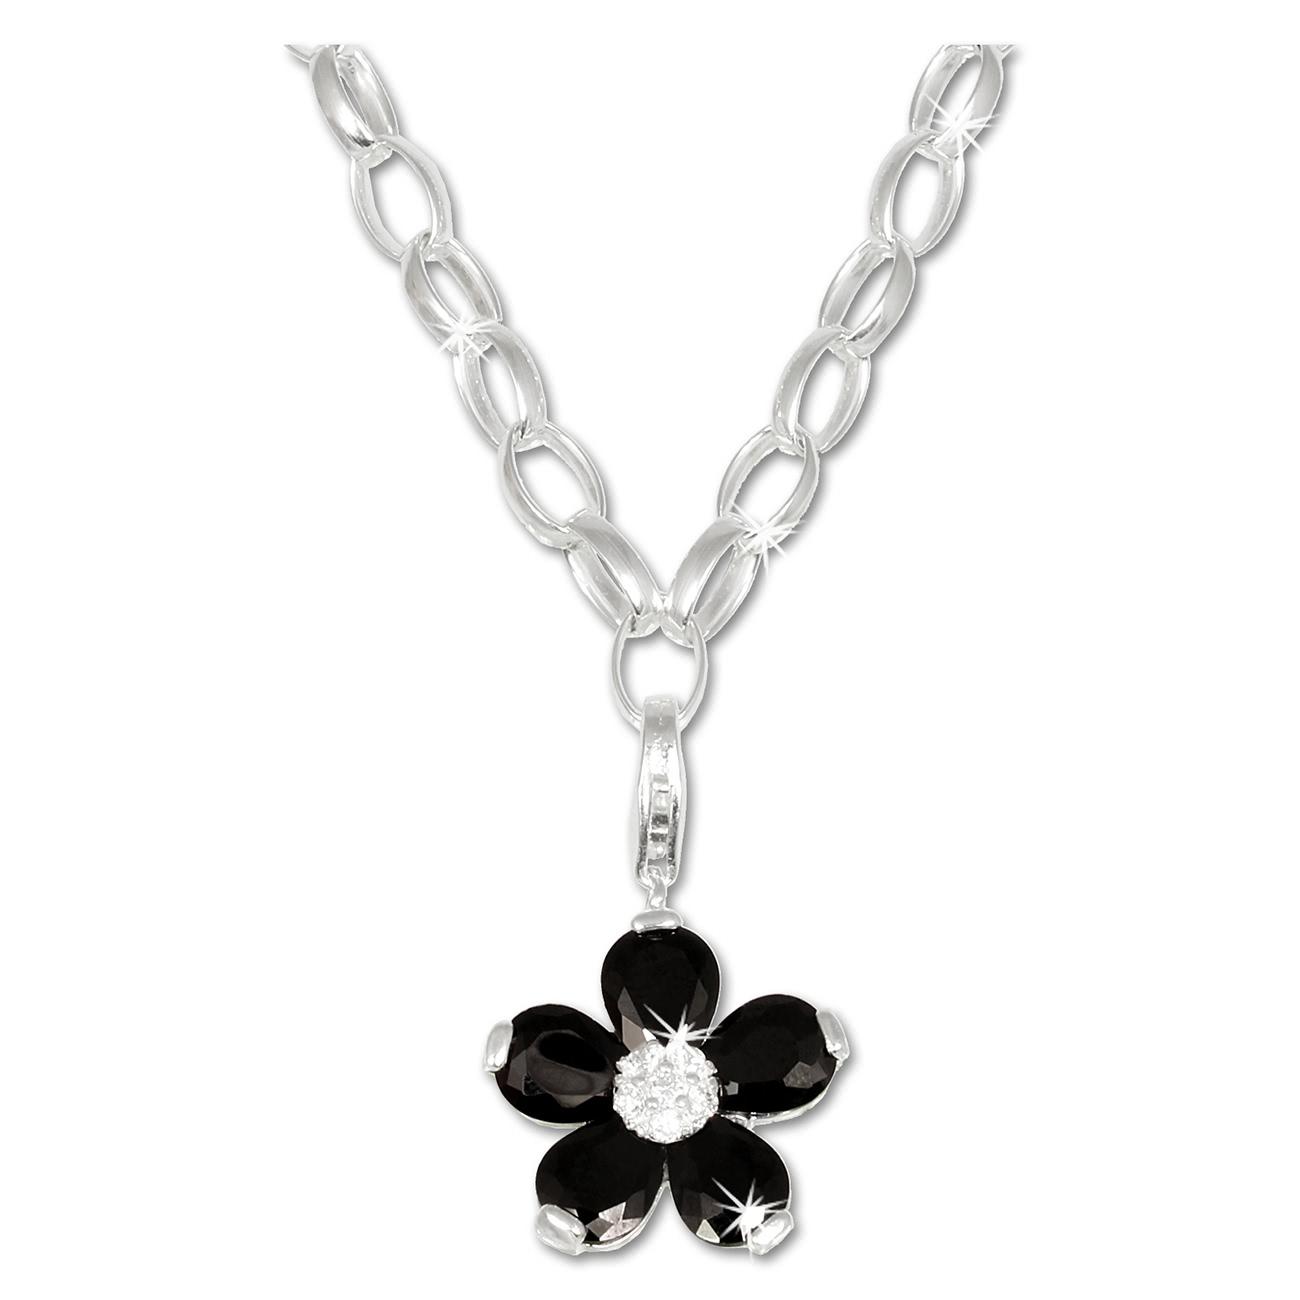 Halsketten Set Blume in 925 Sterling Silber Halskette + Charms Anhänger Silber Dream Charms FCA304